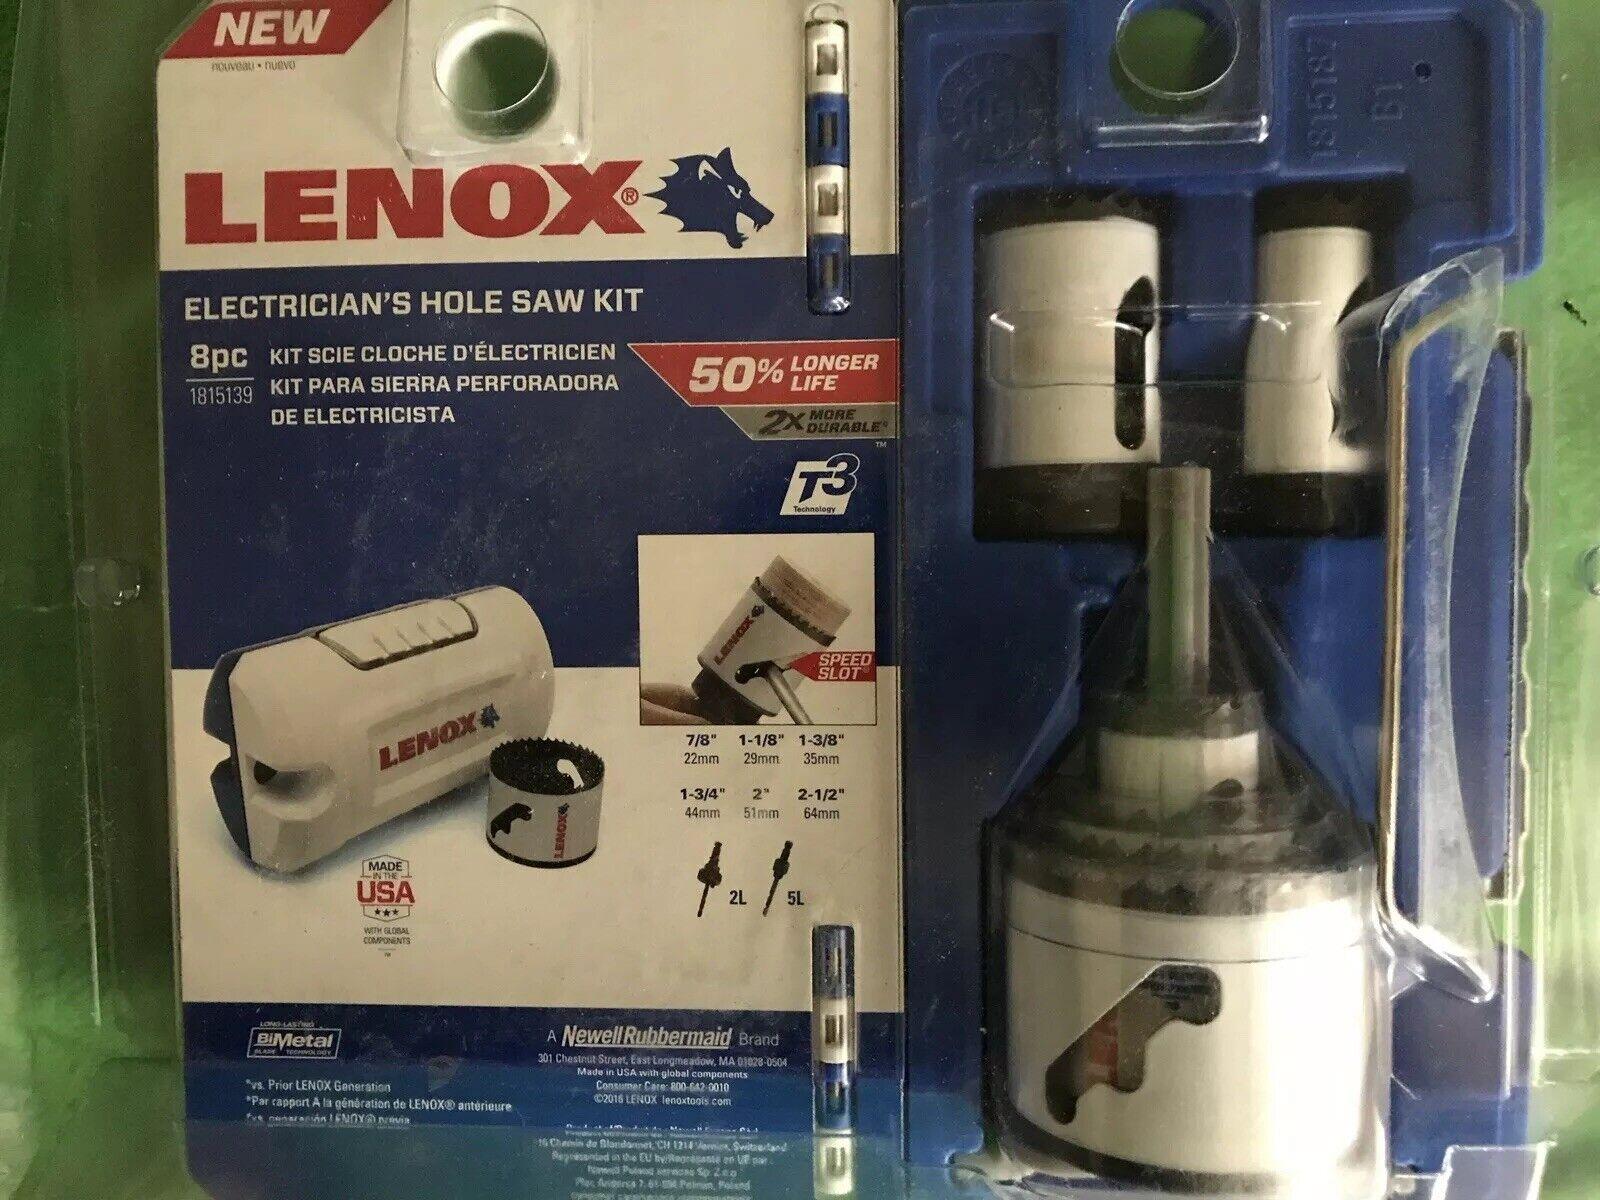 LENOX Tools Bi-Metal Speed Slot Hole Saw with T3 Tech, Electrician's Kit 8-piece